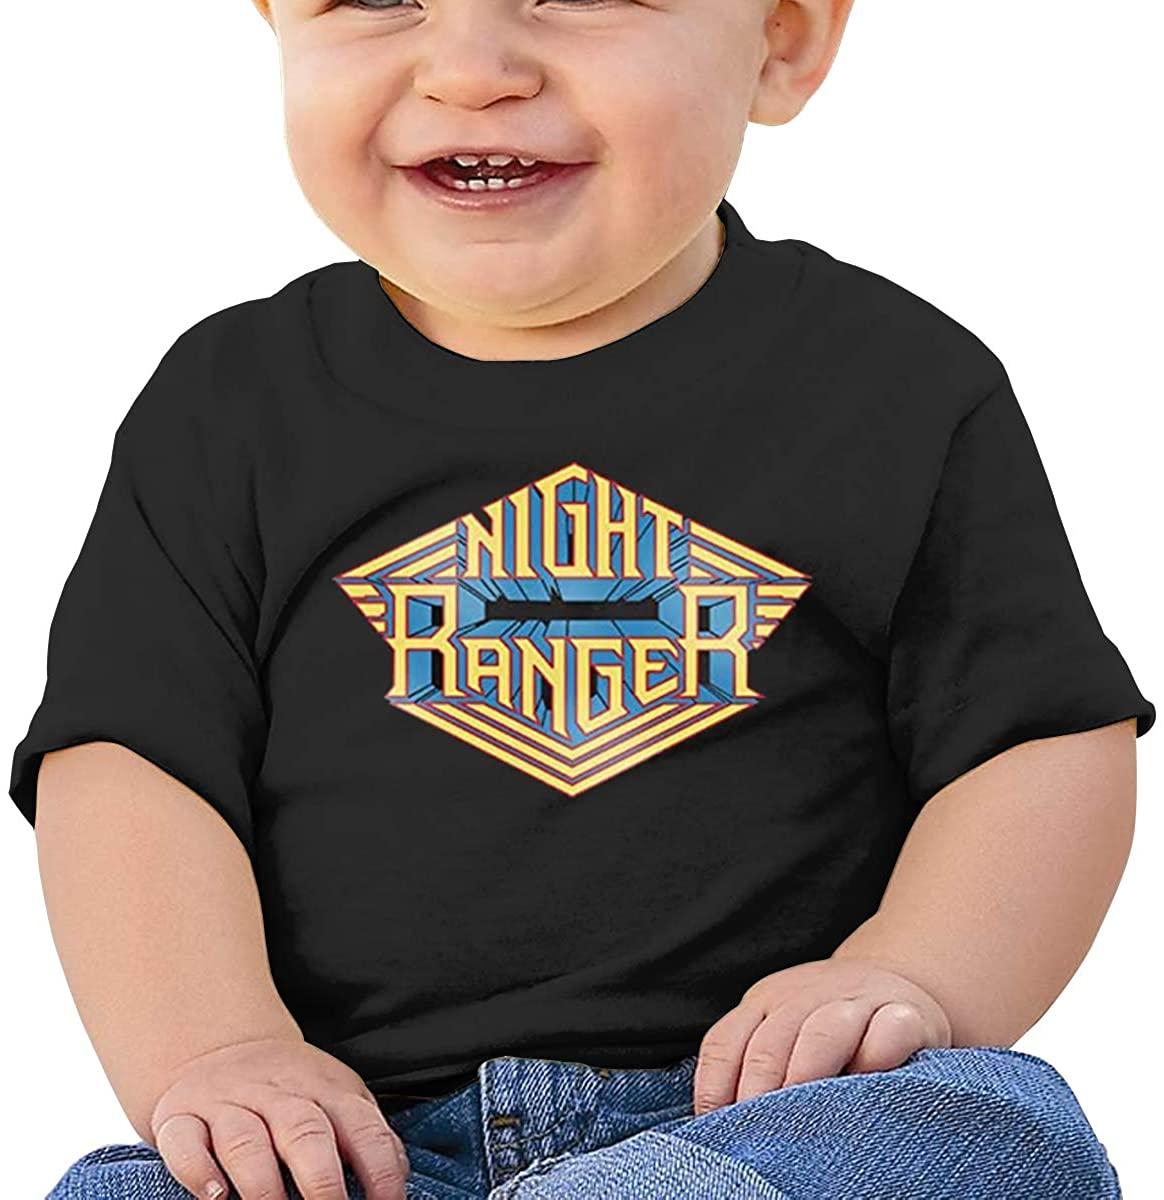 6-24 Months Boy and Girl Baby Short Sleeve T-Shirt Night Ranger Original Minimalist Style Black